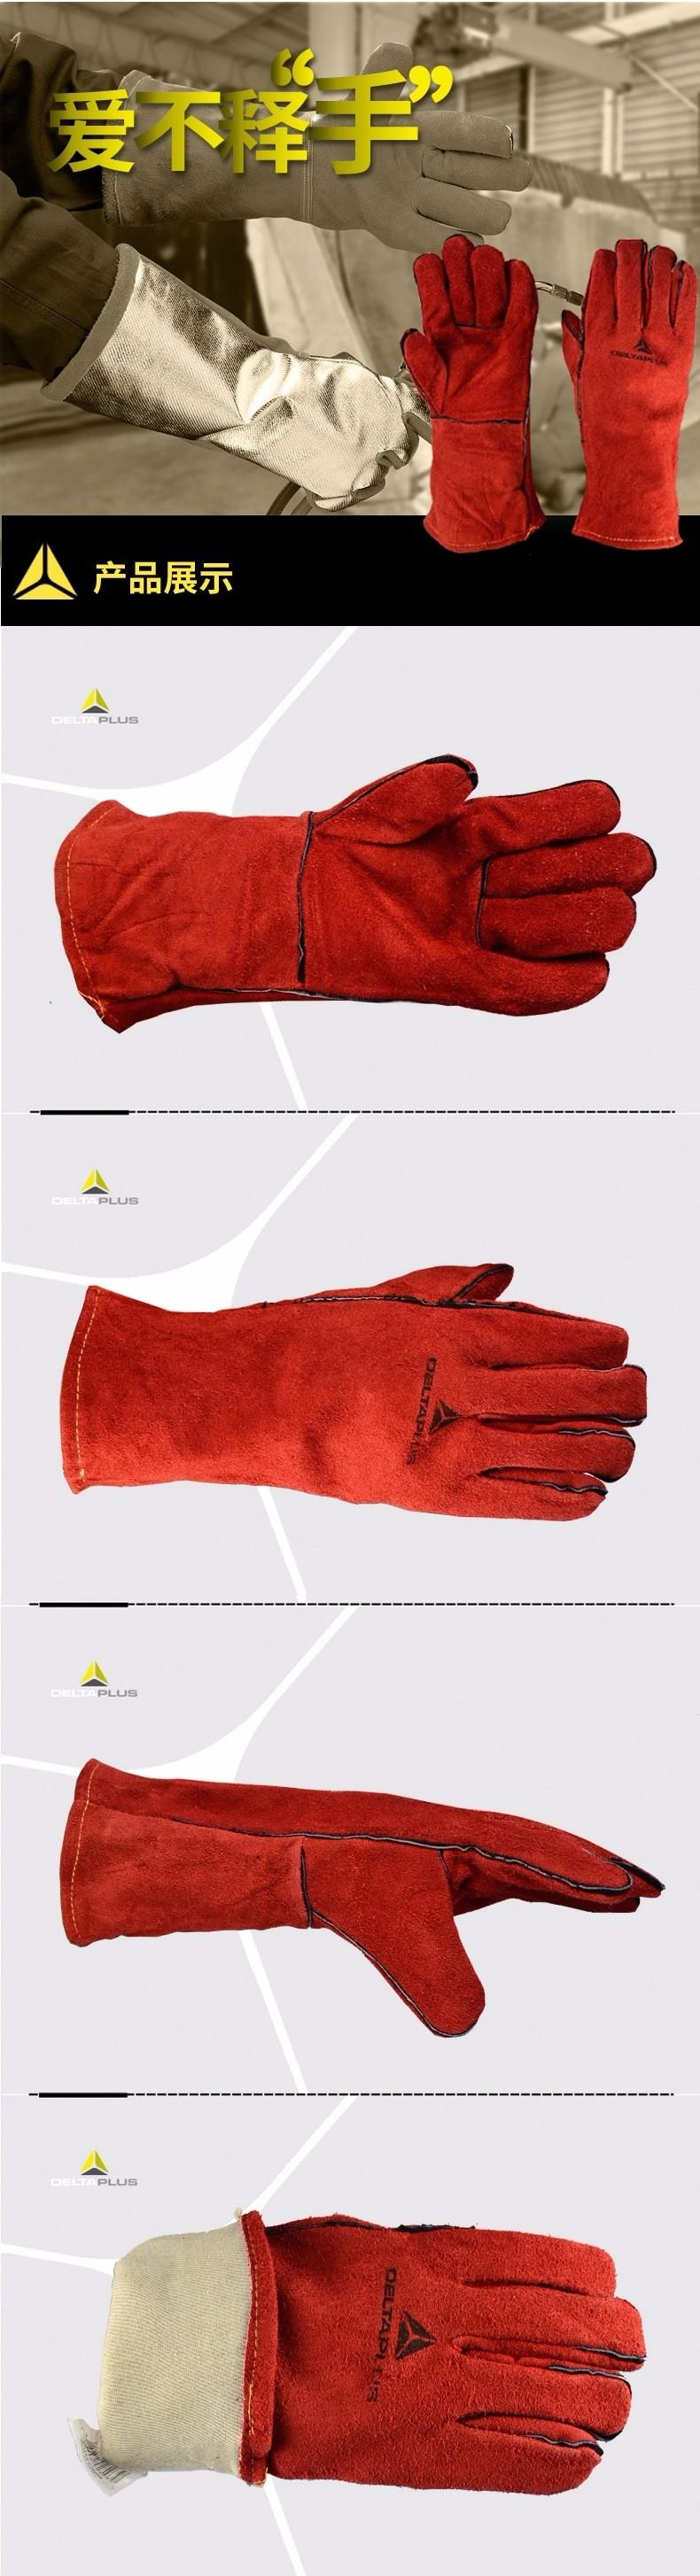 Deltaplus welding gloves welder\'s cowhide high temperature resistance wear-resistant long design wear-resistant work gloves (3)